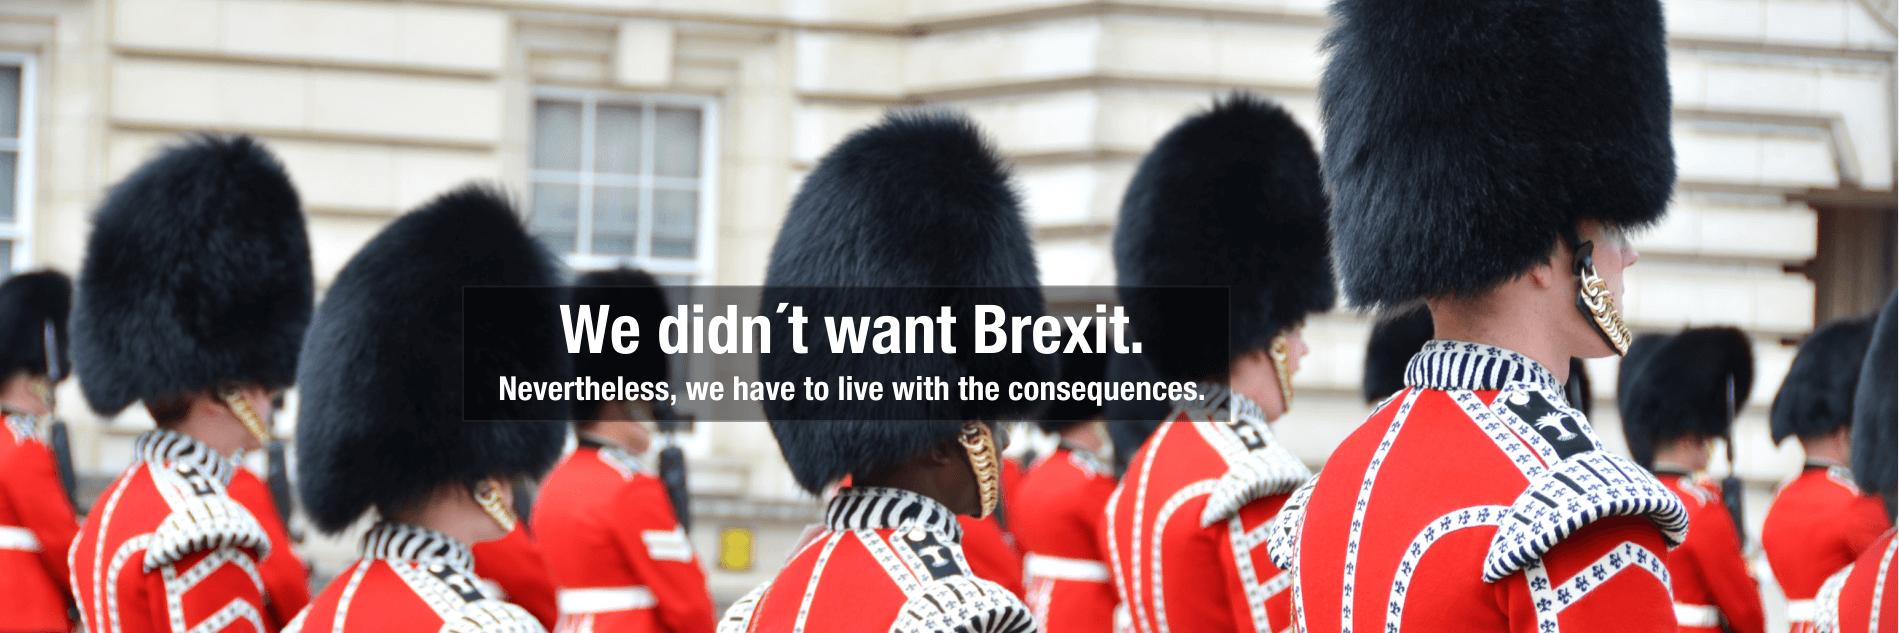 Cloudmarkt_Brexit_2400_Blog3